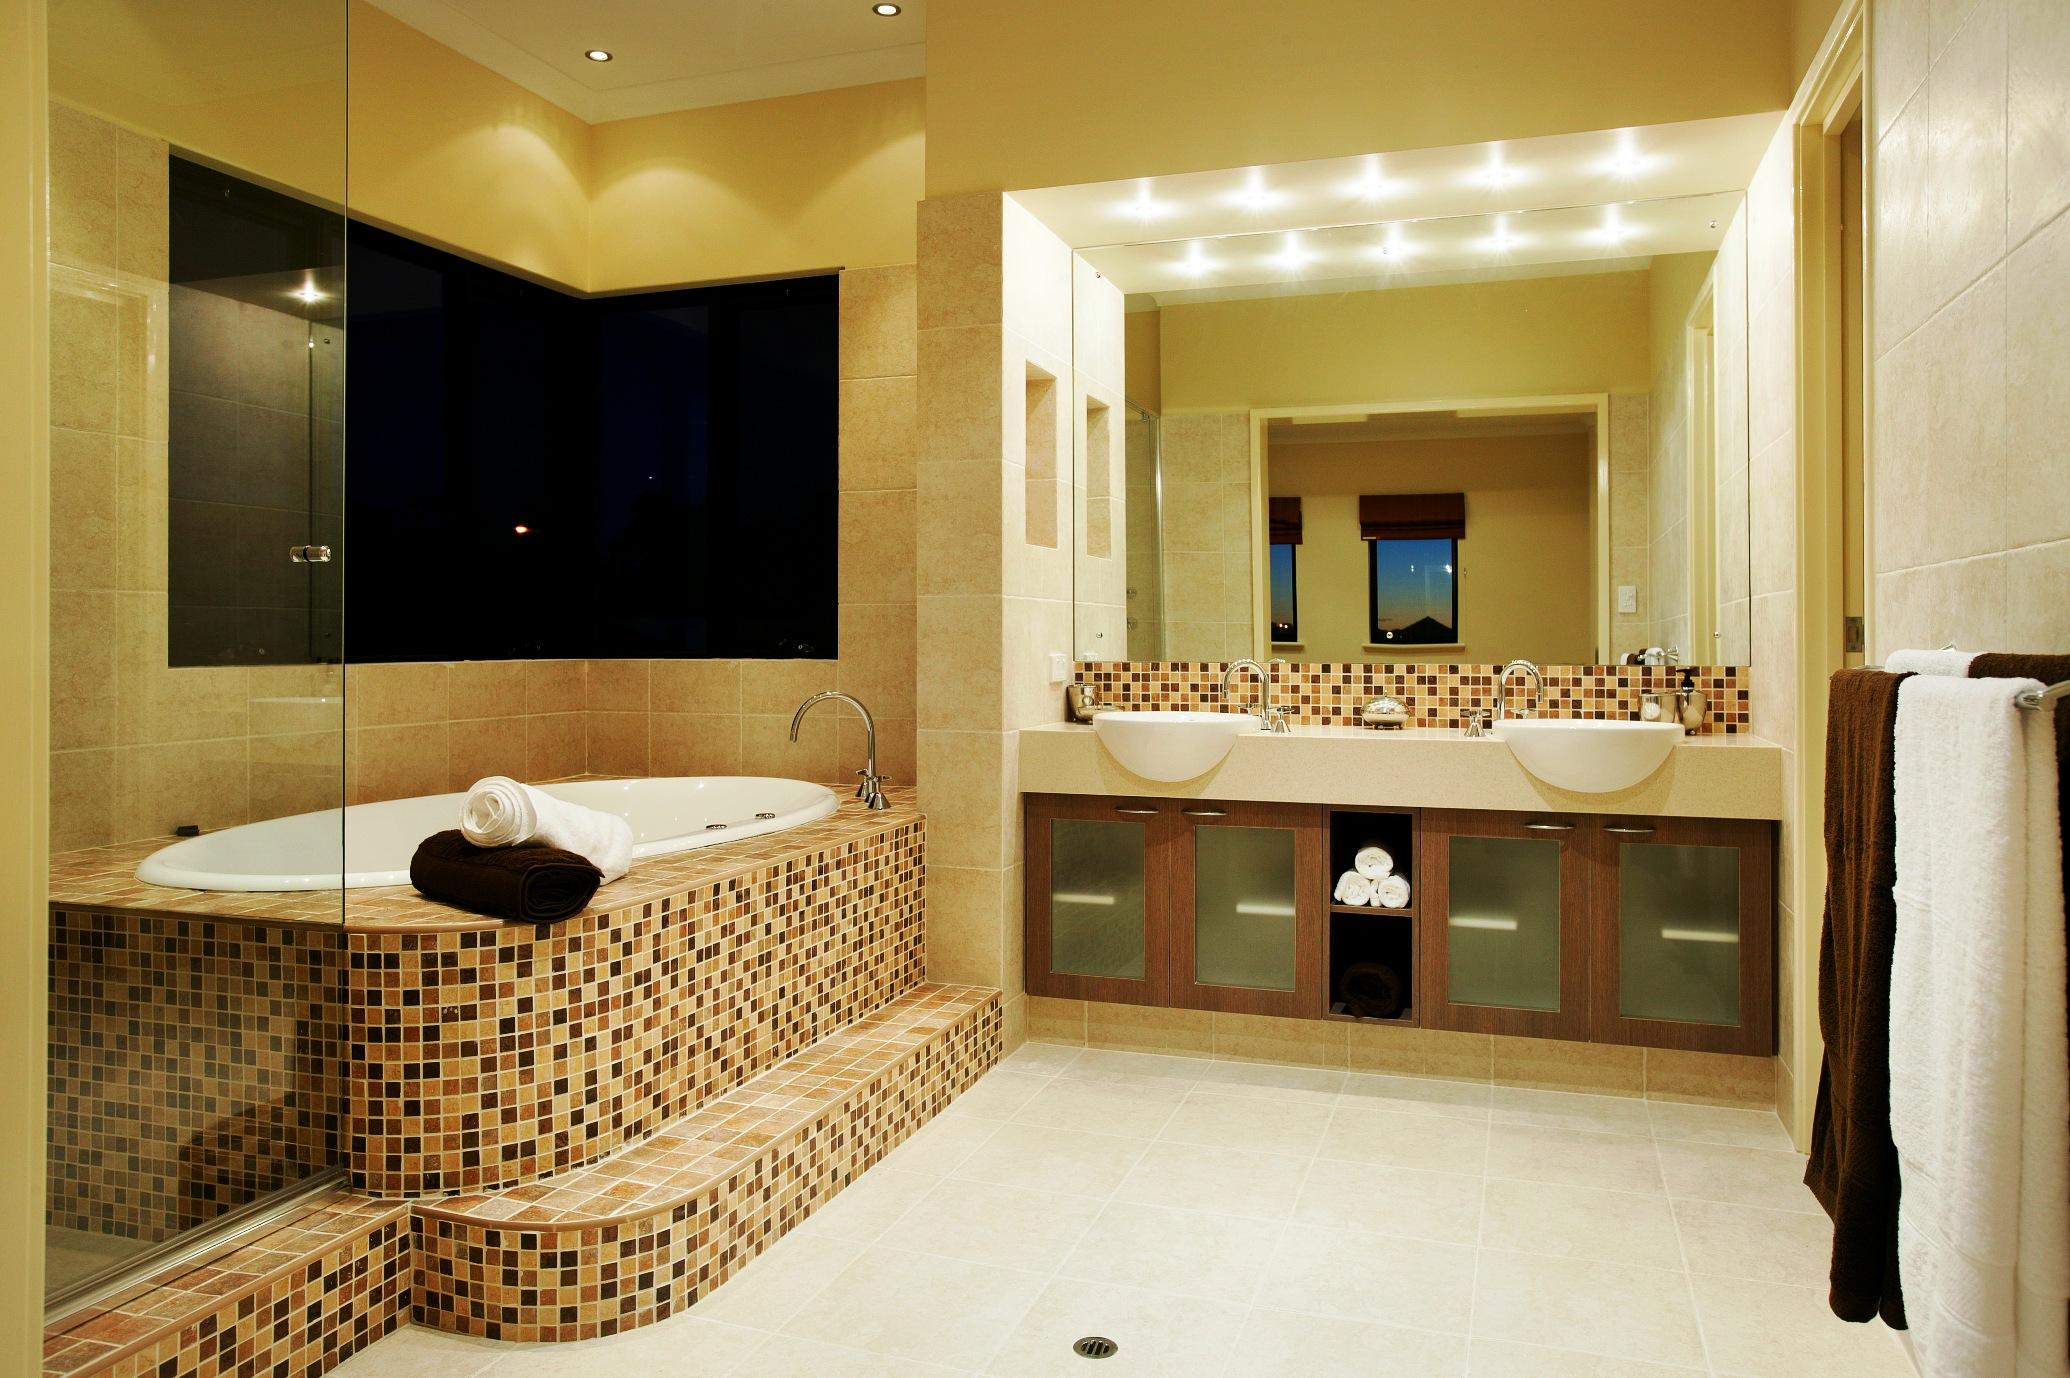 model home bathroom decor photo - 6